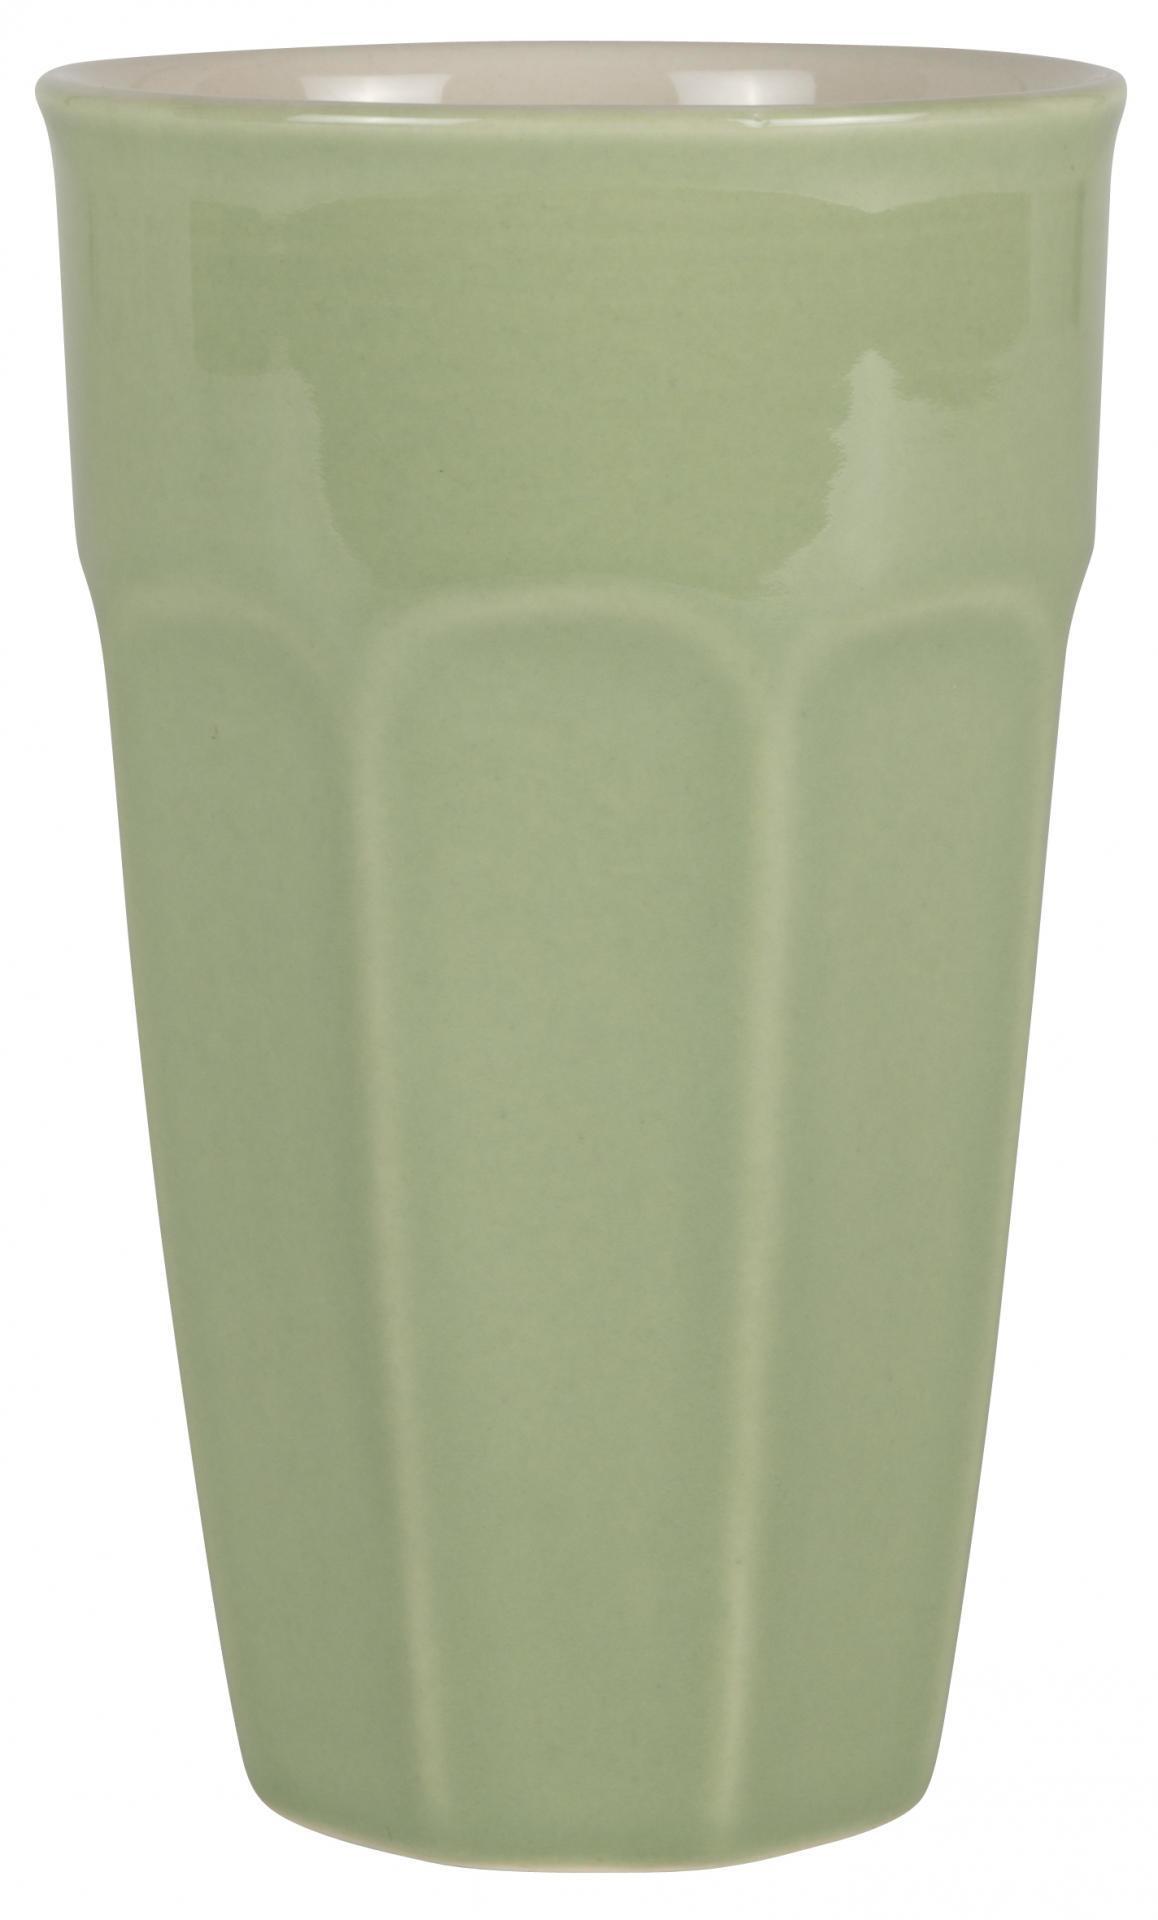 IB LAURSEN Latte hrneček Mynte Meadow green 400 ml, zelená barva, keramika